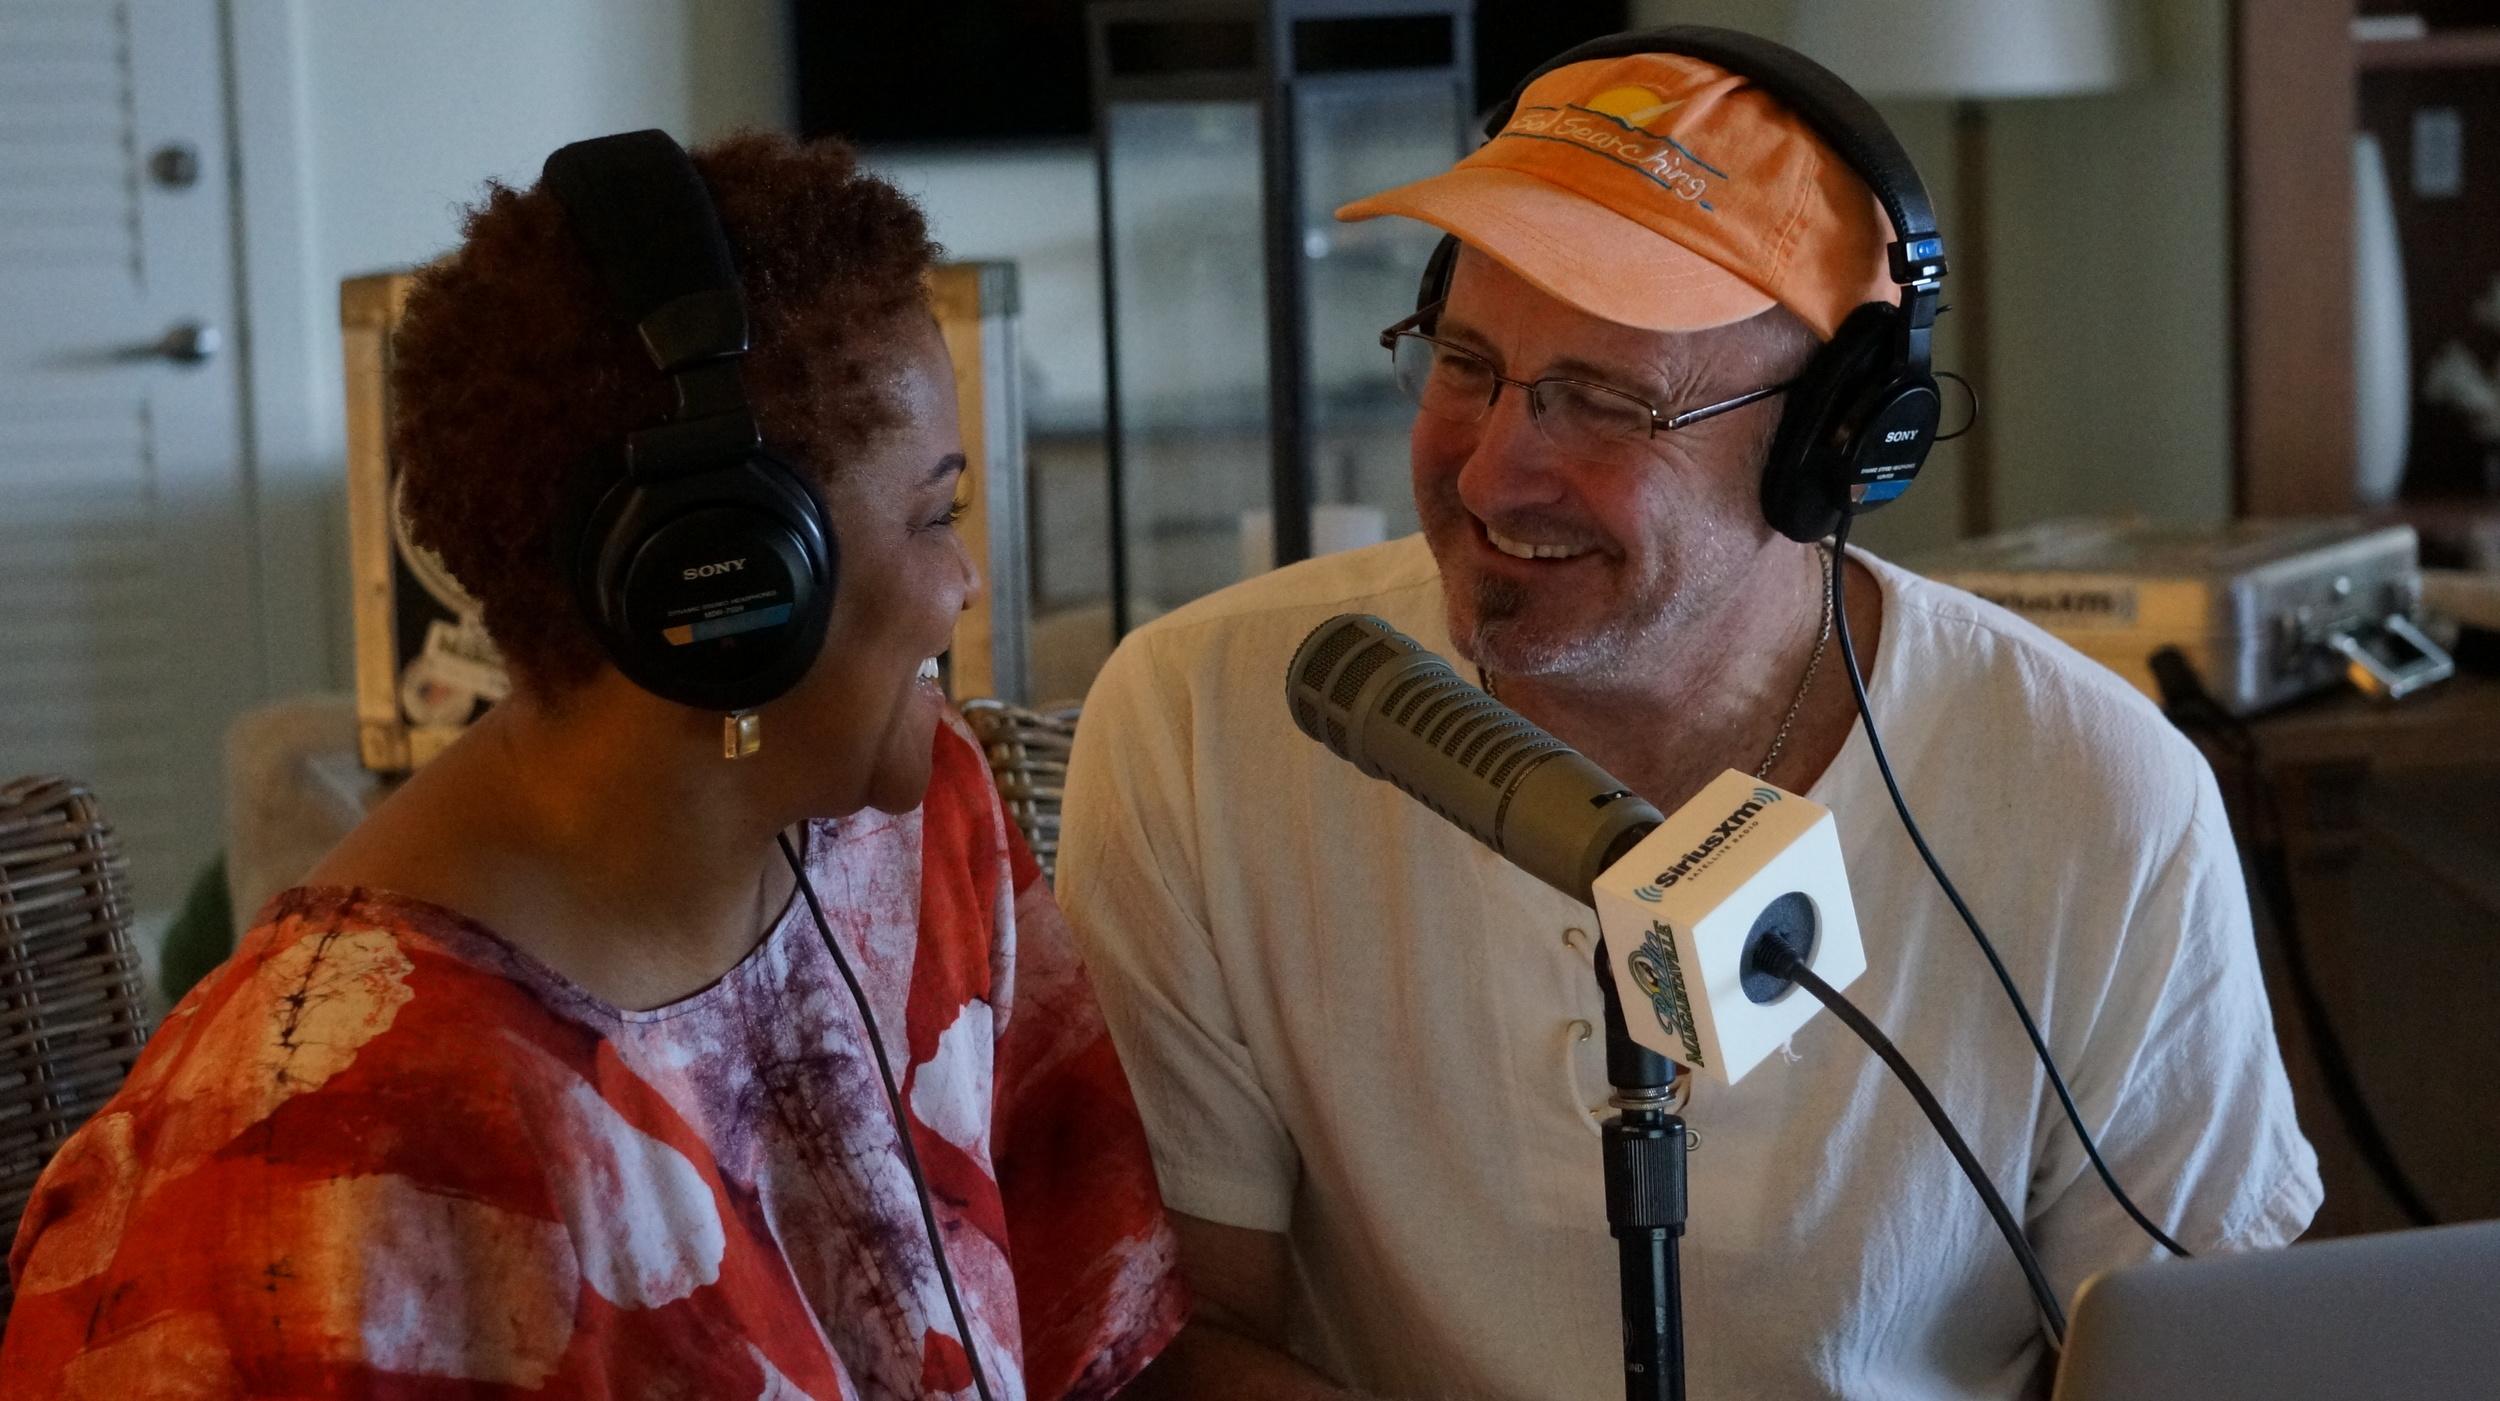 Coral Reefer Nadirah Shakoor with JD Spradlin on Radio Margaritaville at the Margaritaville Hollywood Beach Resort